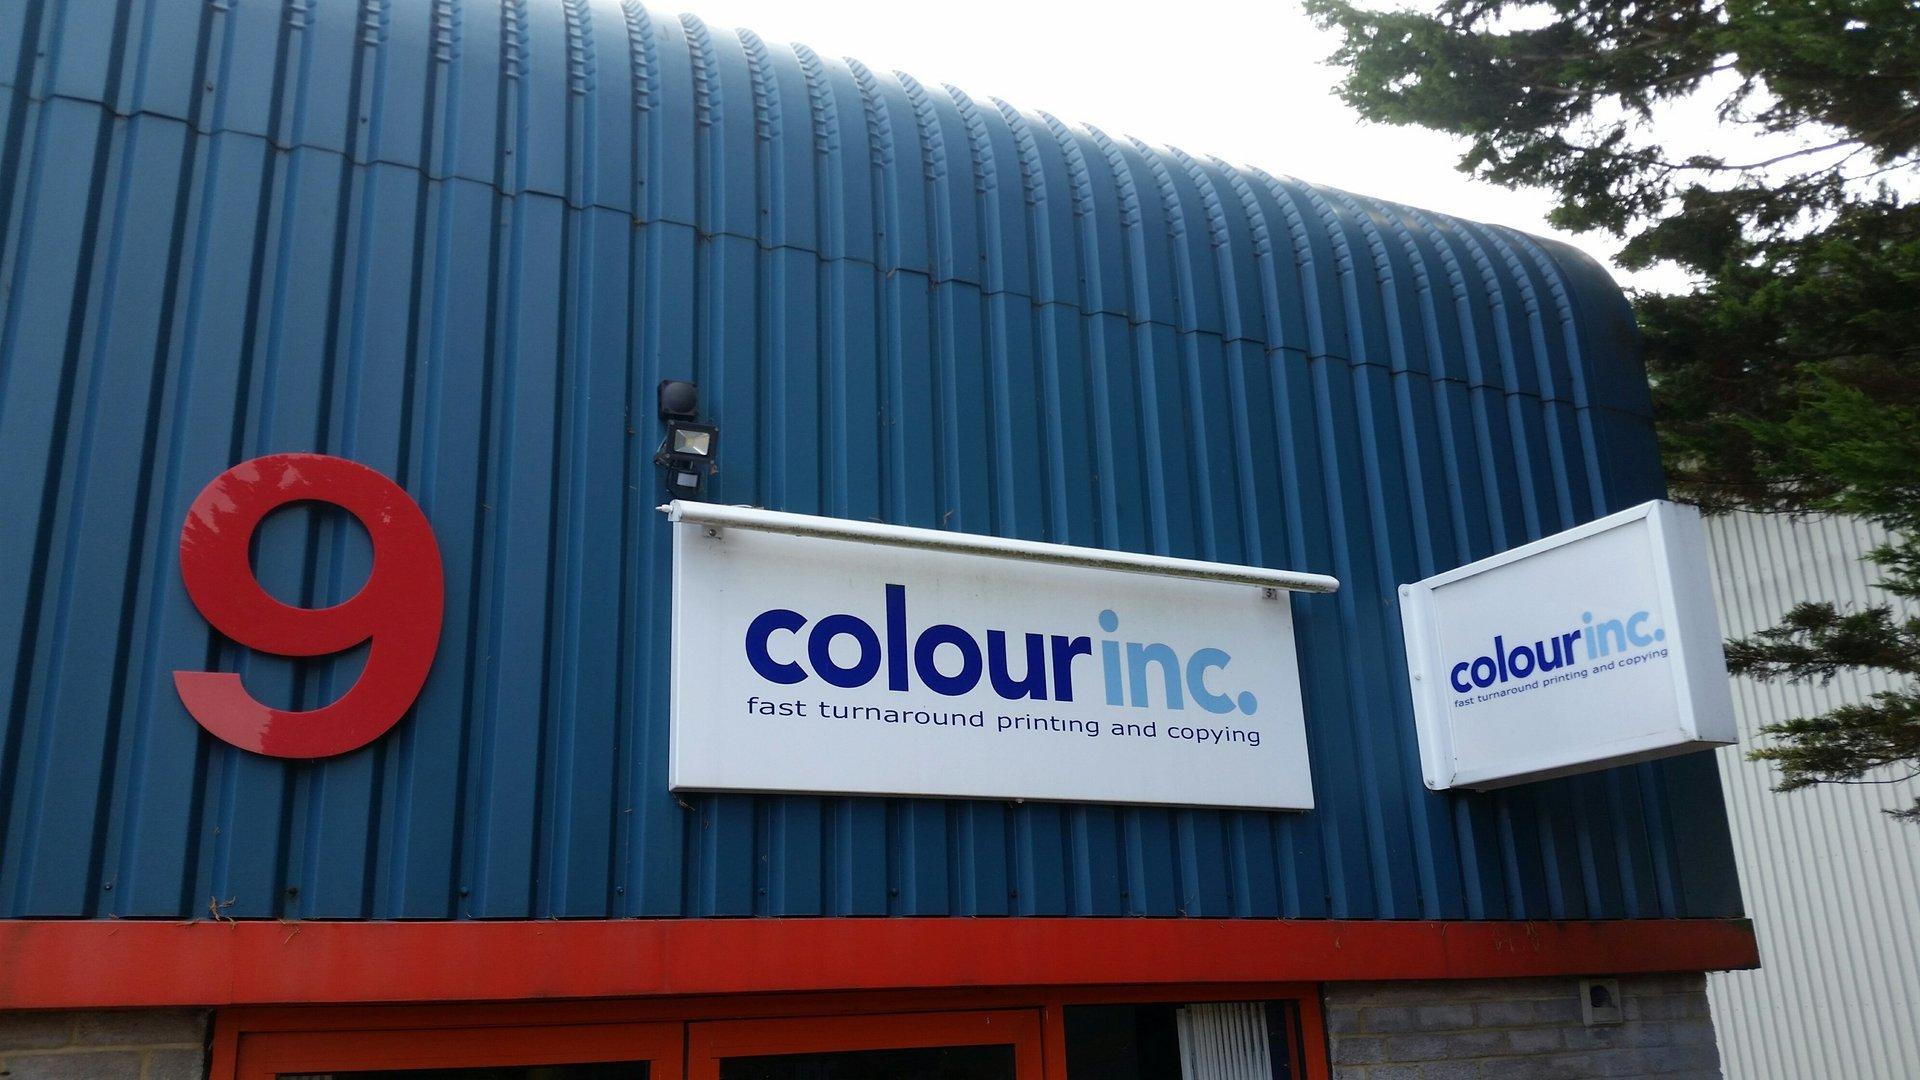 Colour Inc signage